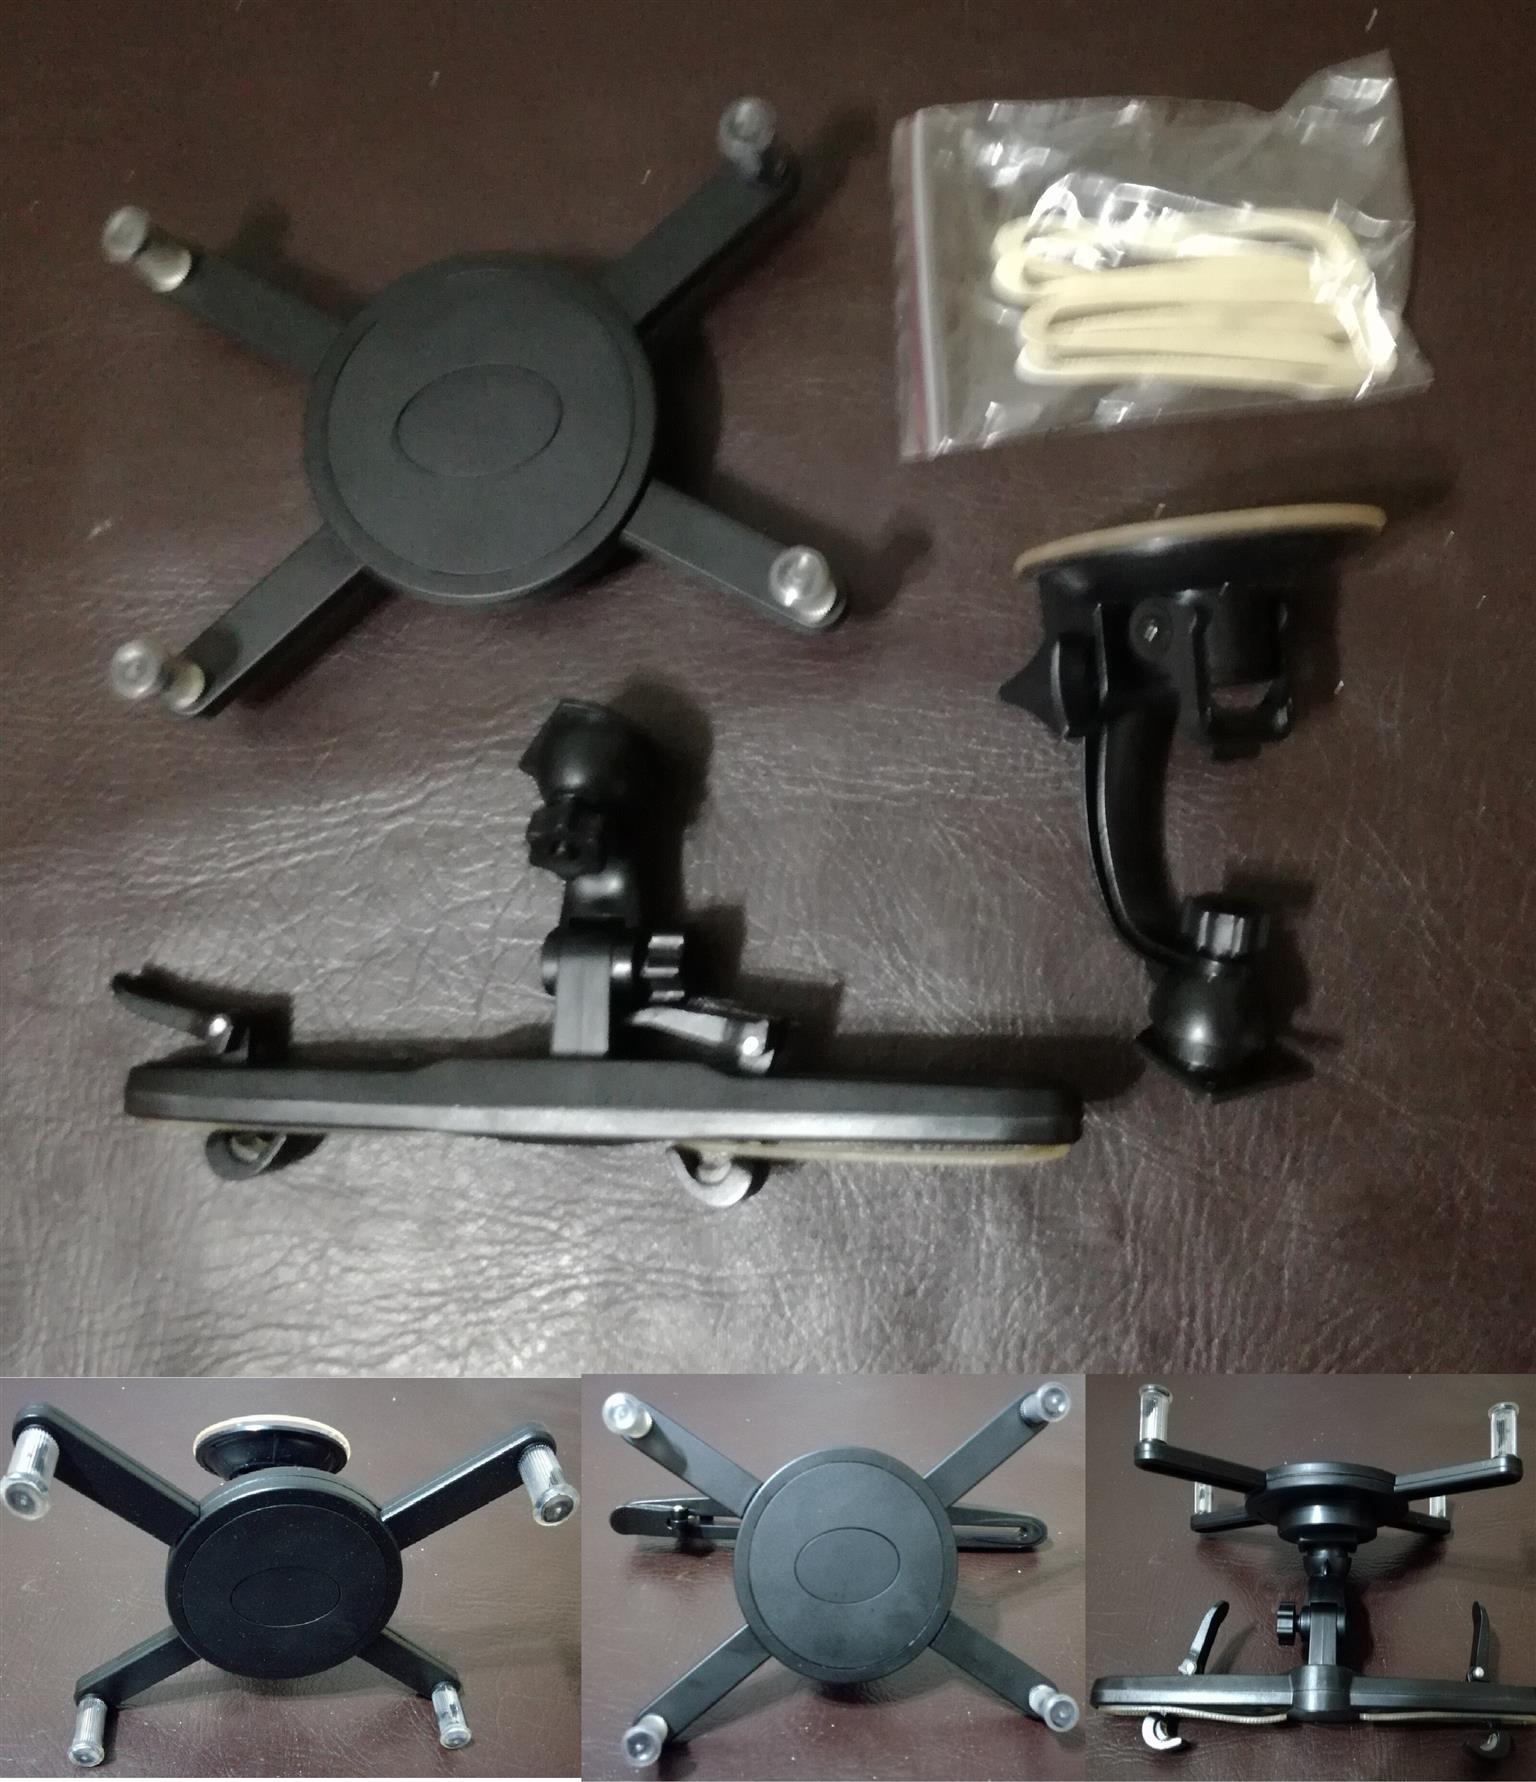 Stramm Adjustable Motor Car Tablet / Ipad Holder  QTY